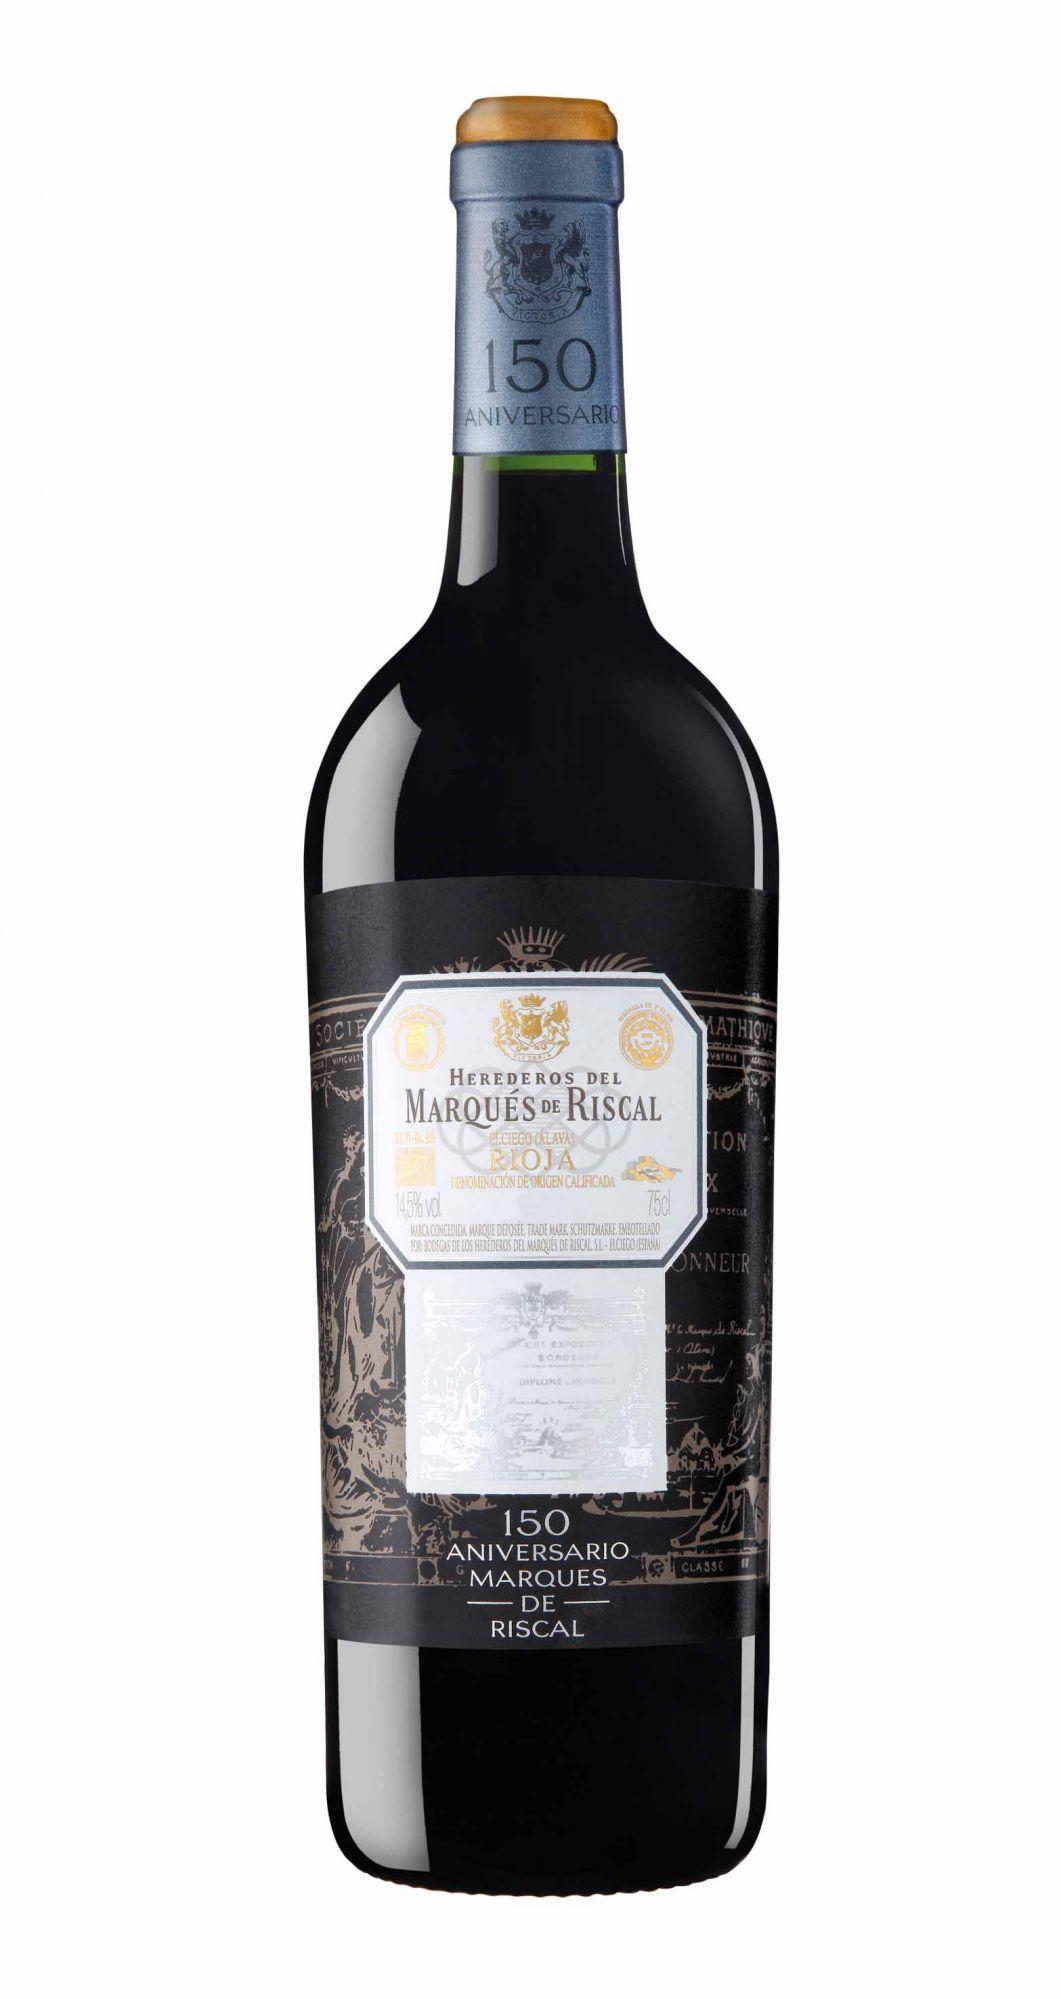 Marqués de Riscal Rioja 150 Anniversario Gran Reserva 2010, Spain